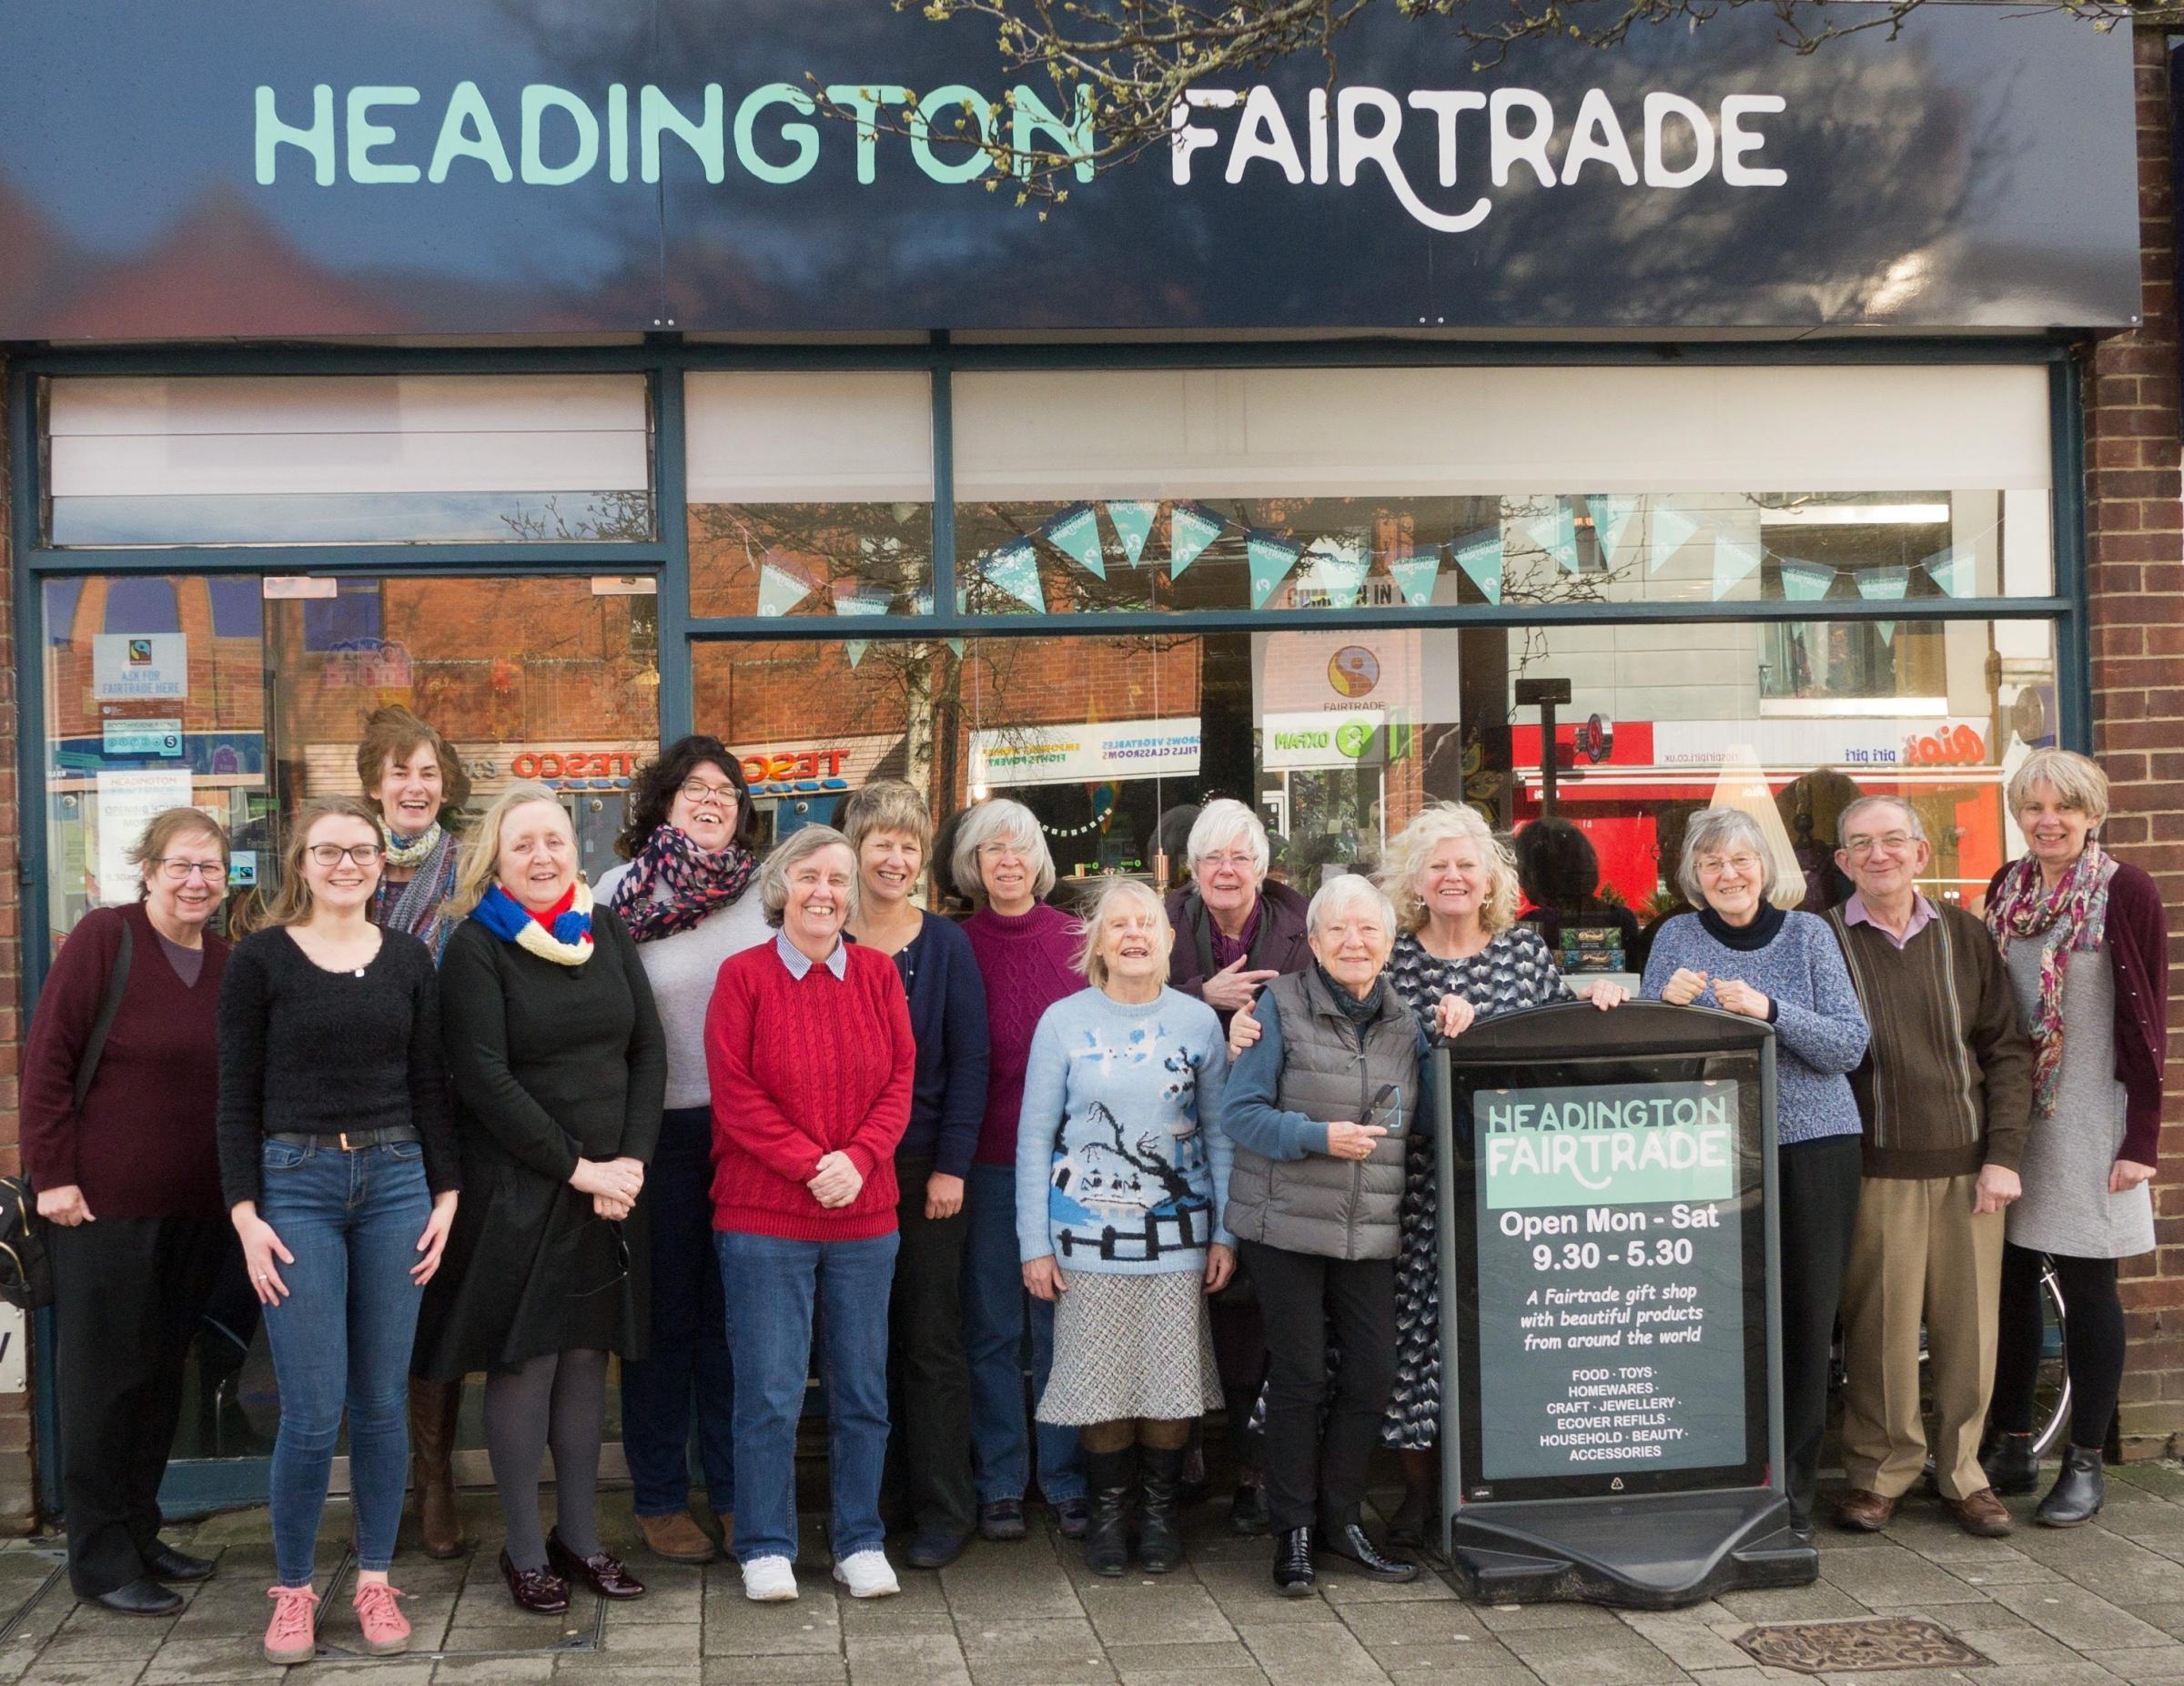 Headington Fairtrade shop volunteers and committee outside the London Road store. Picture: Headington Fairtrade